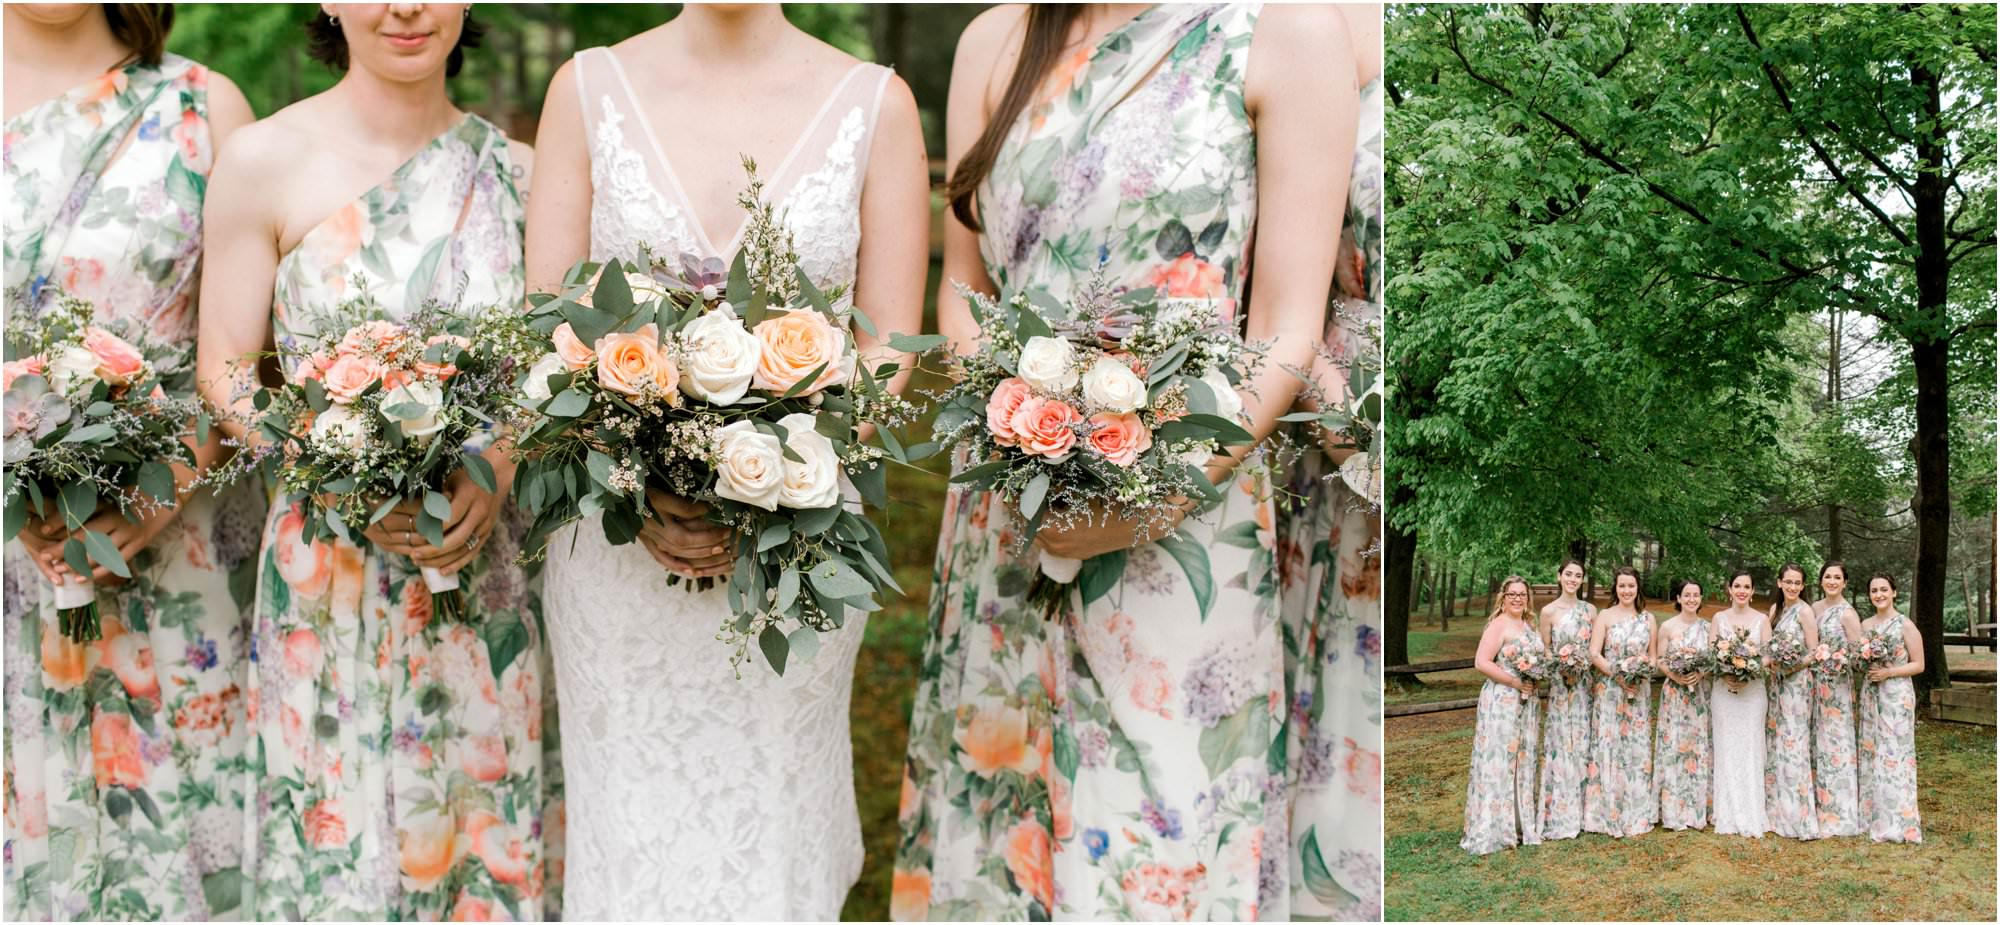 spring pavilion on crystal lake wedding floral bridesmaid dresses